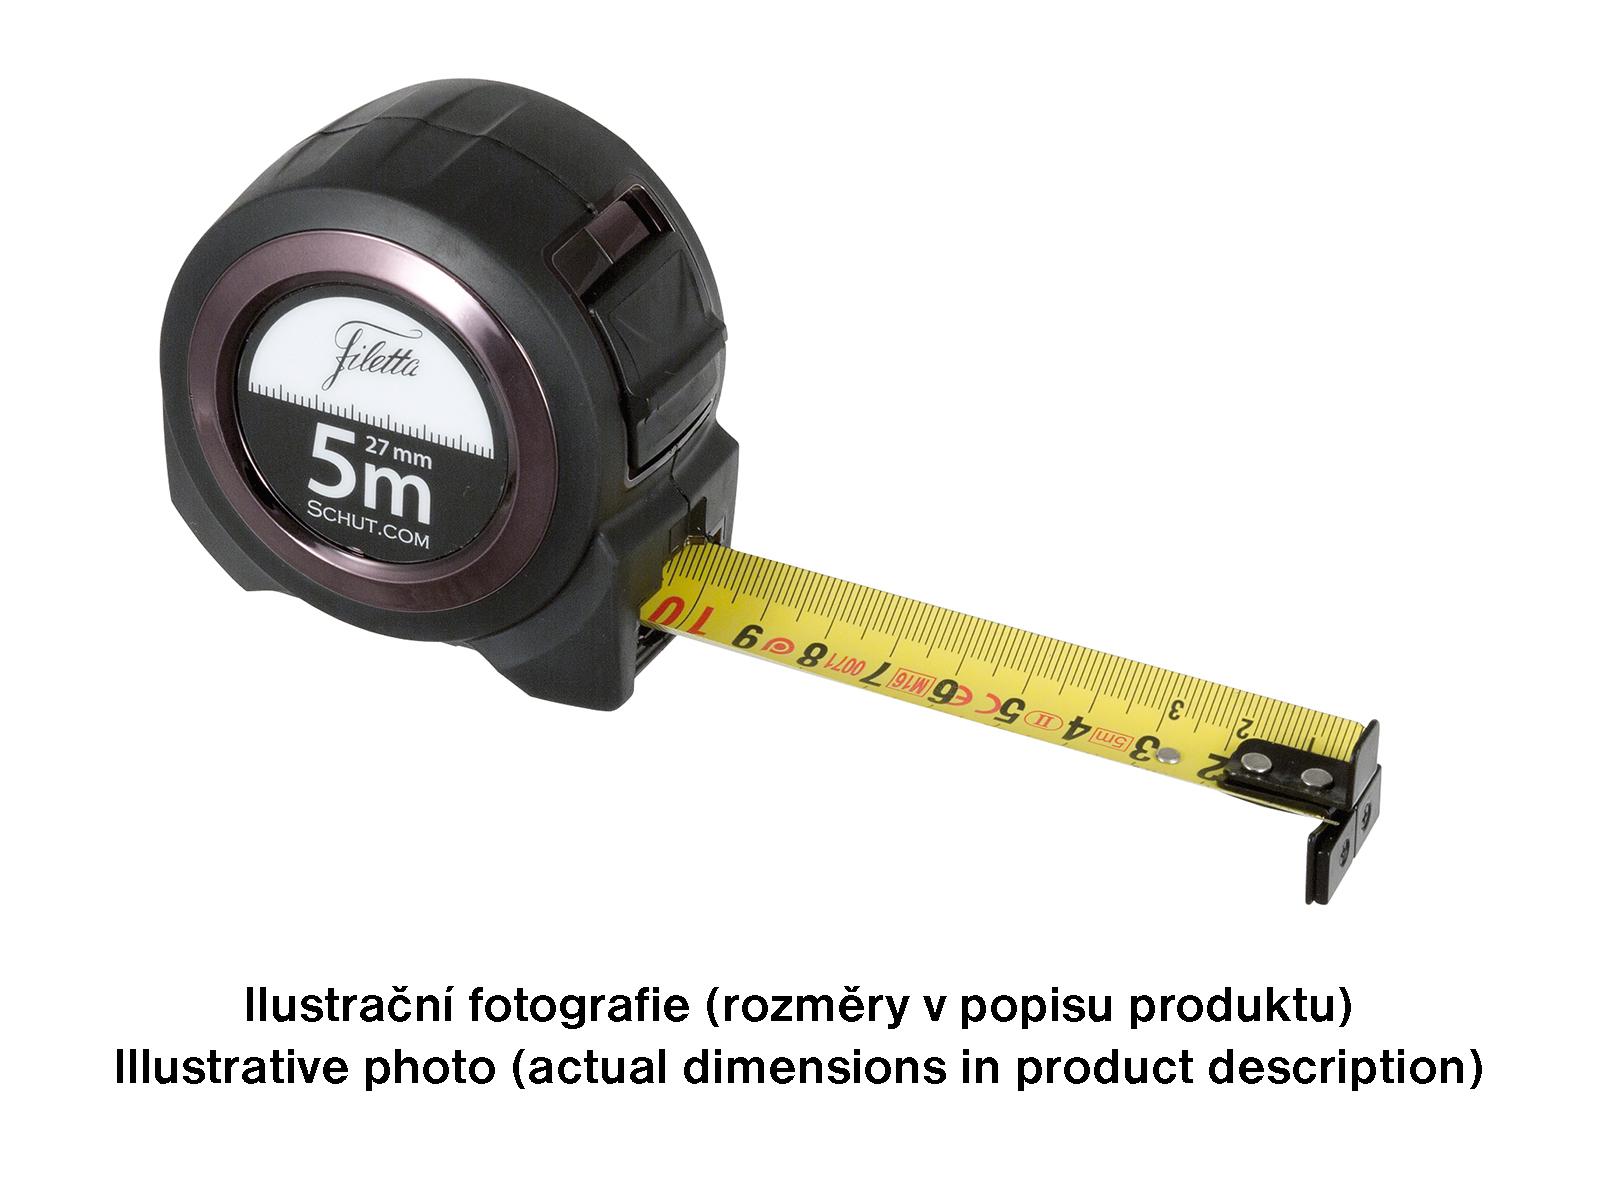 Professional precision tape 3 m / 19 mm EC class I